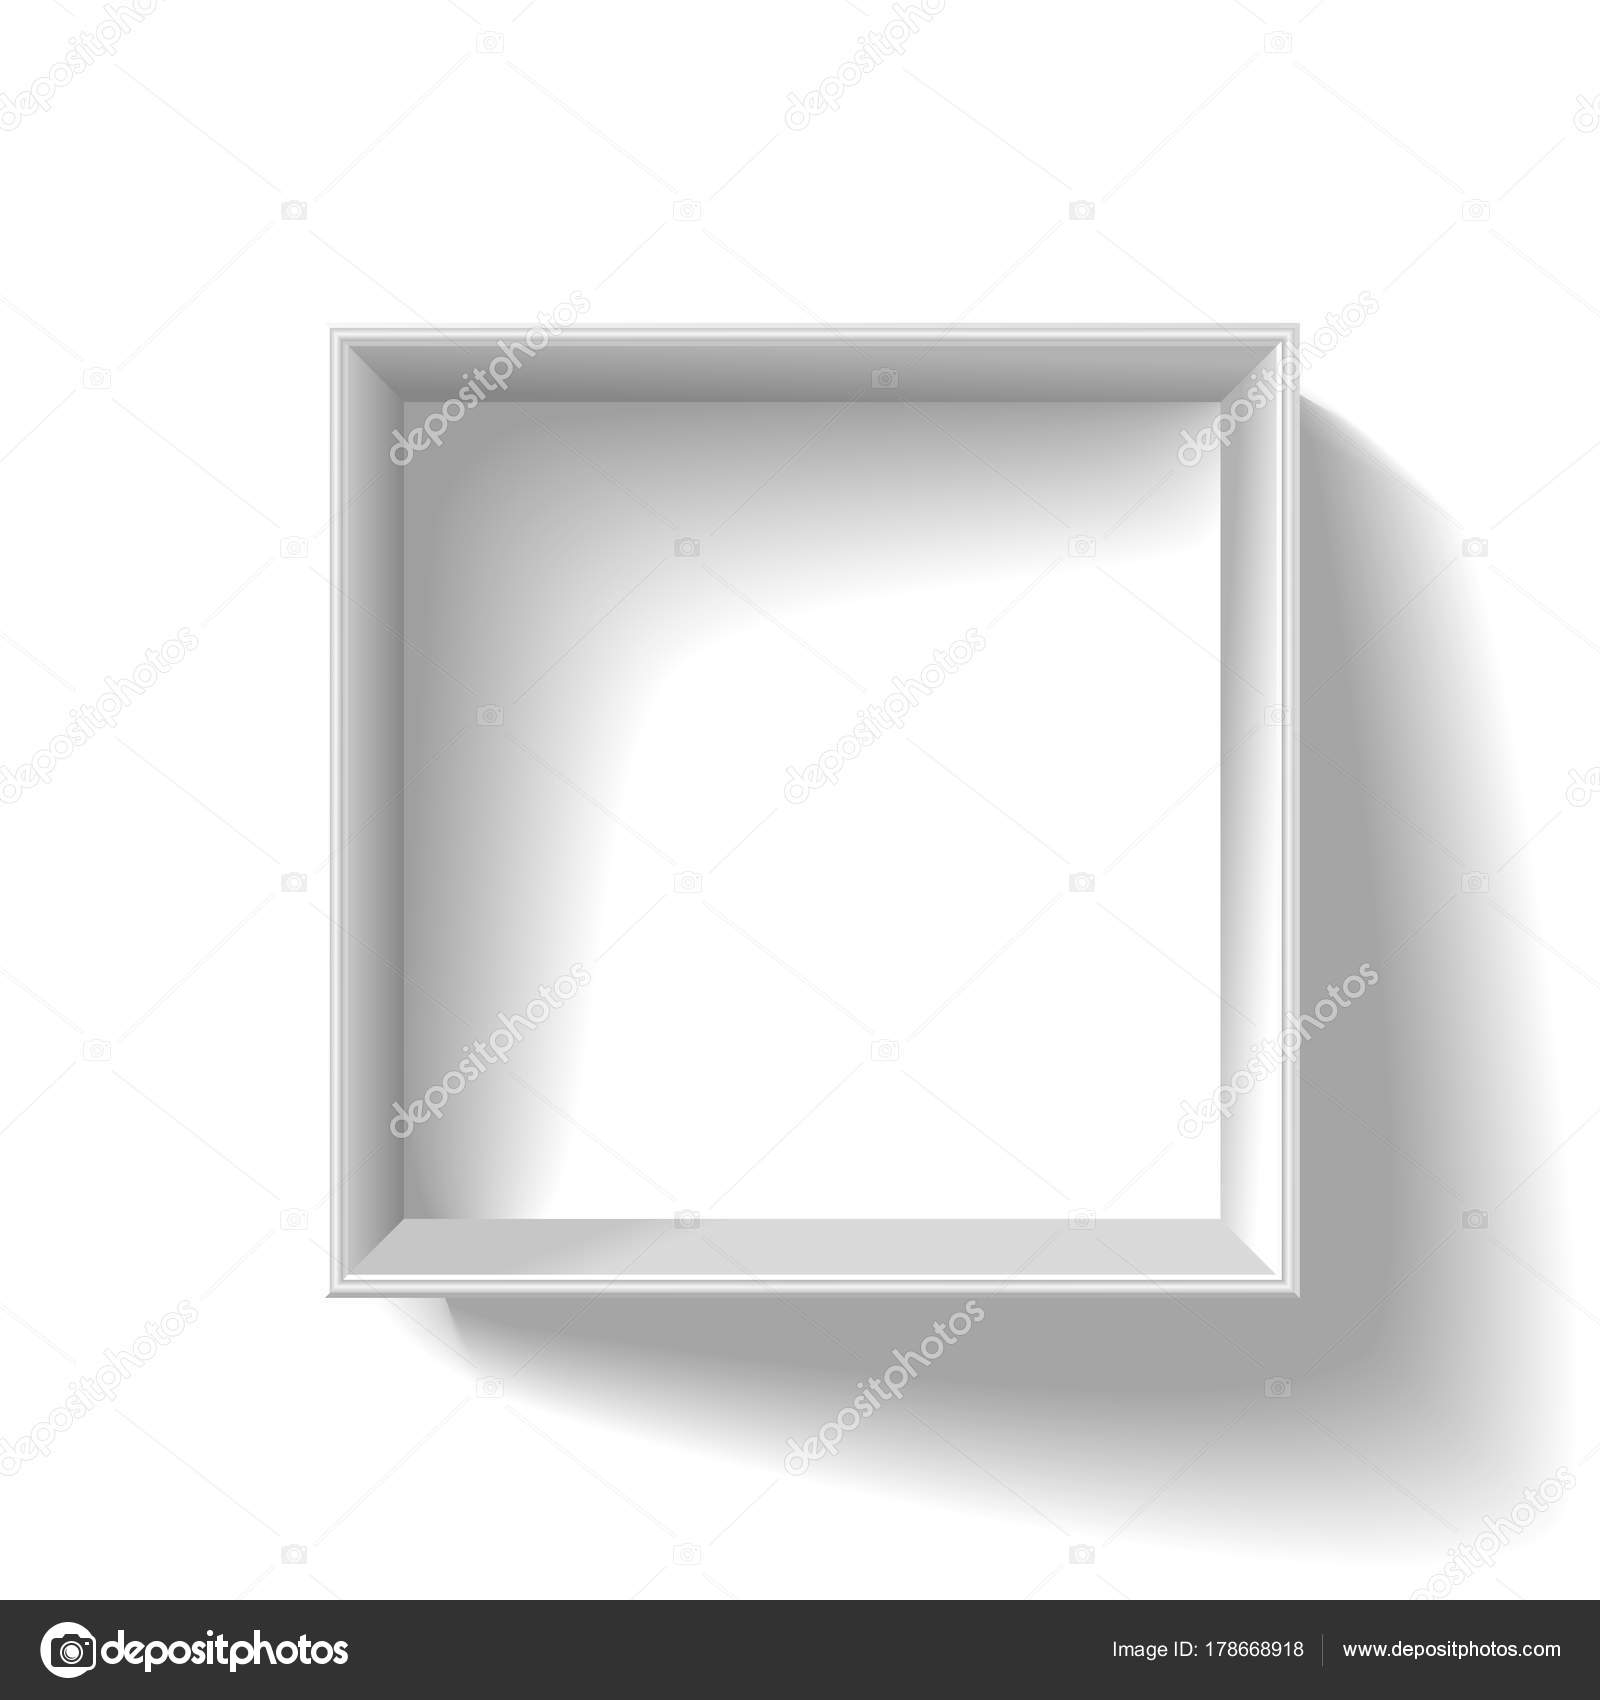 Blanco caja de cartón abierta plazas vacía aislada sobre fondo ...